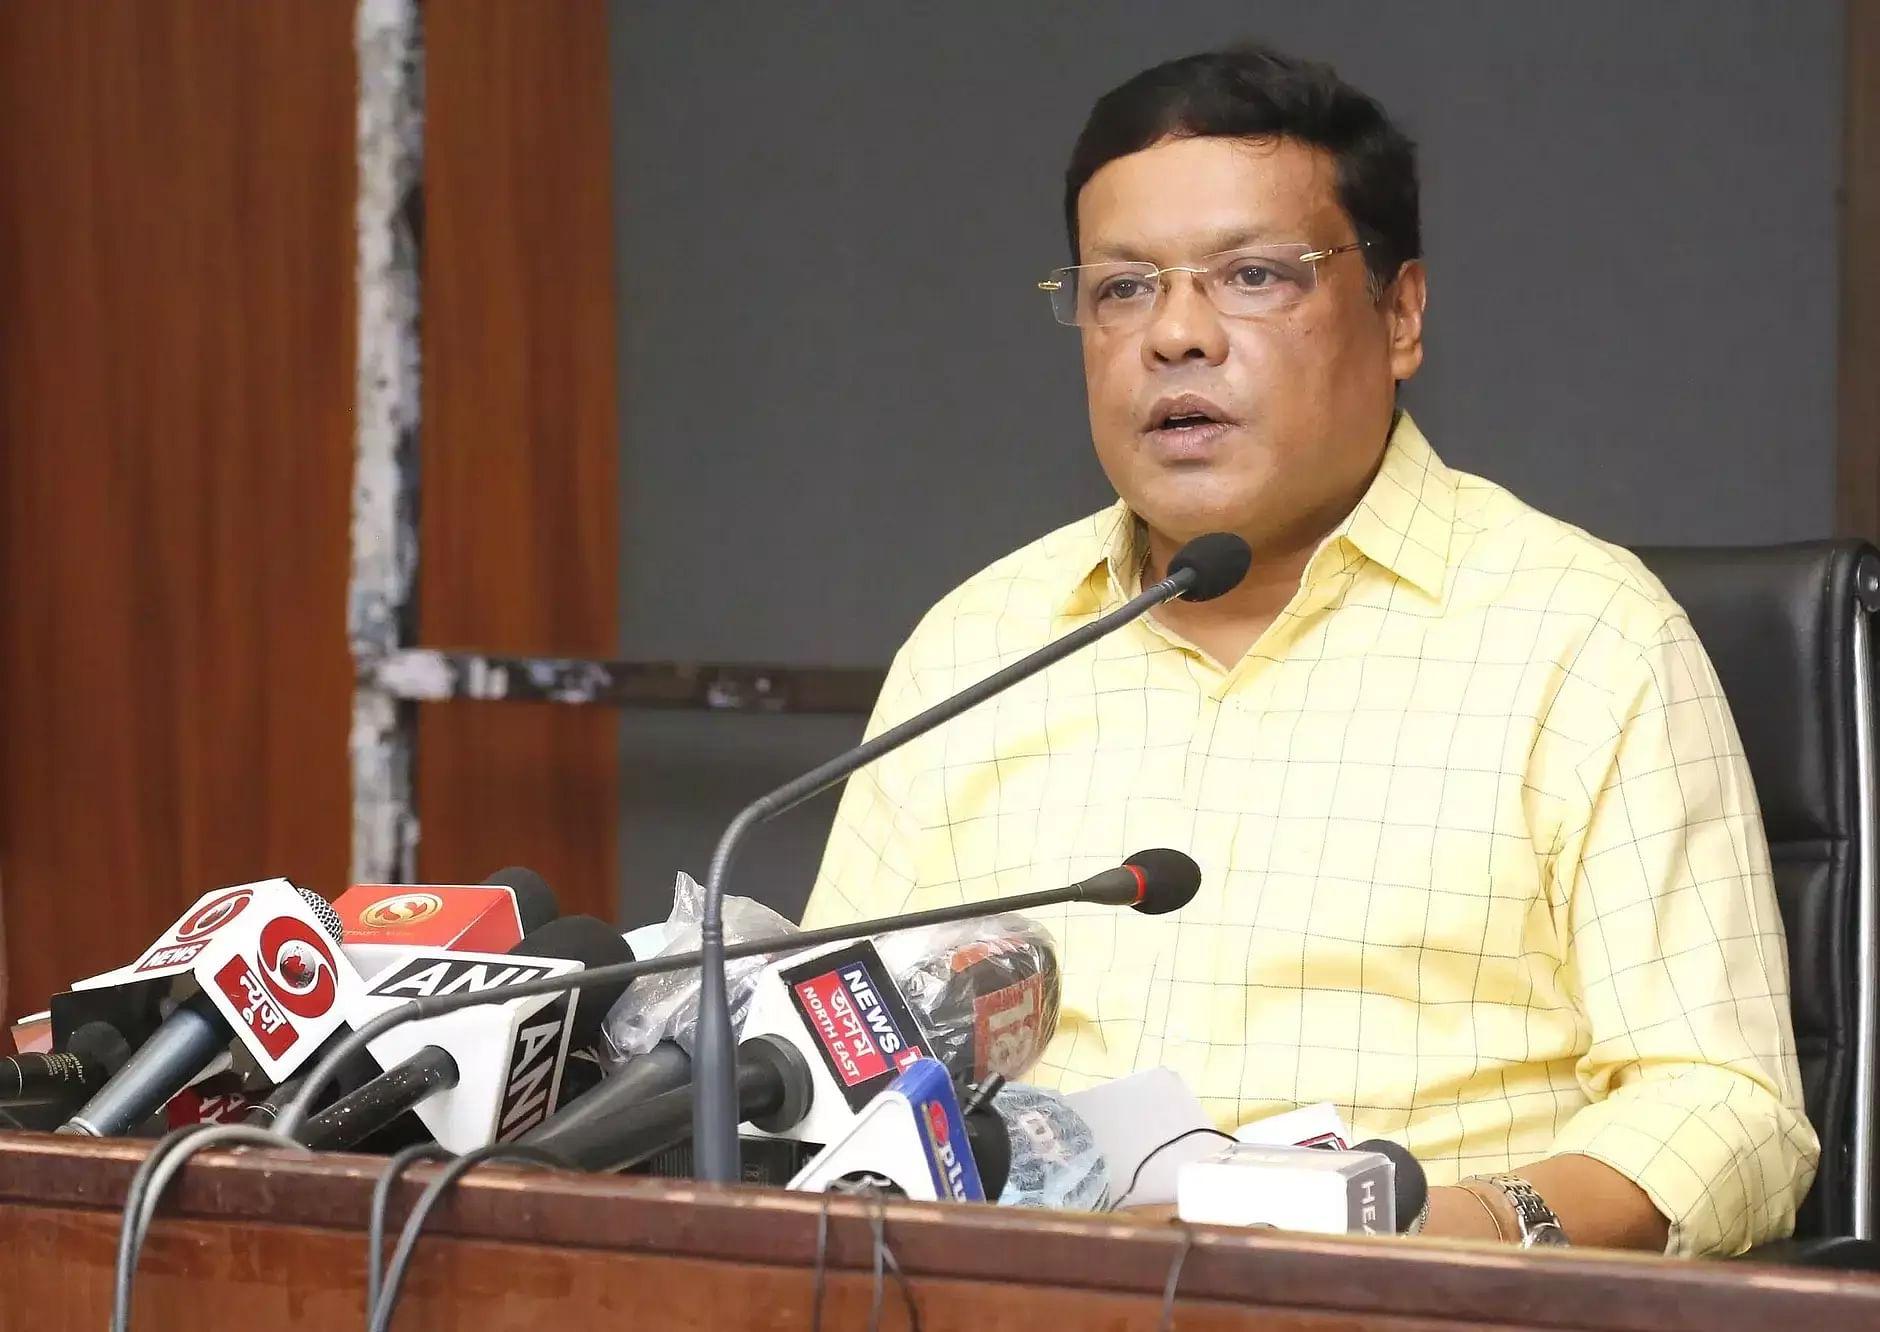 Weekend lockdown & night curfew lifted; Assam CS issued fresh unlock guidelines